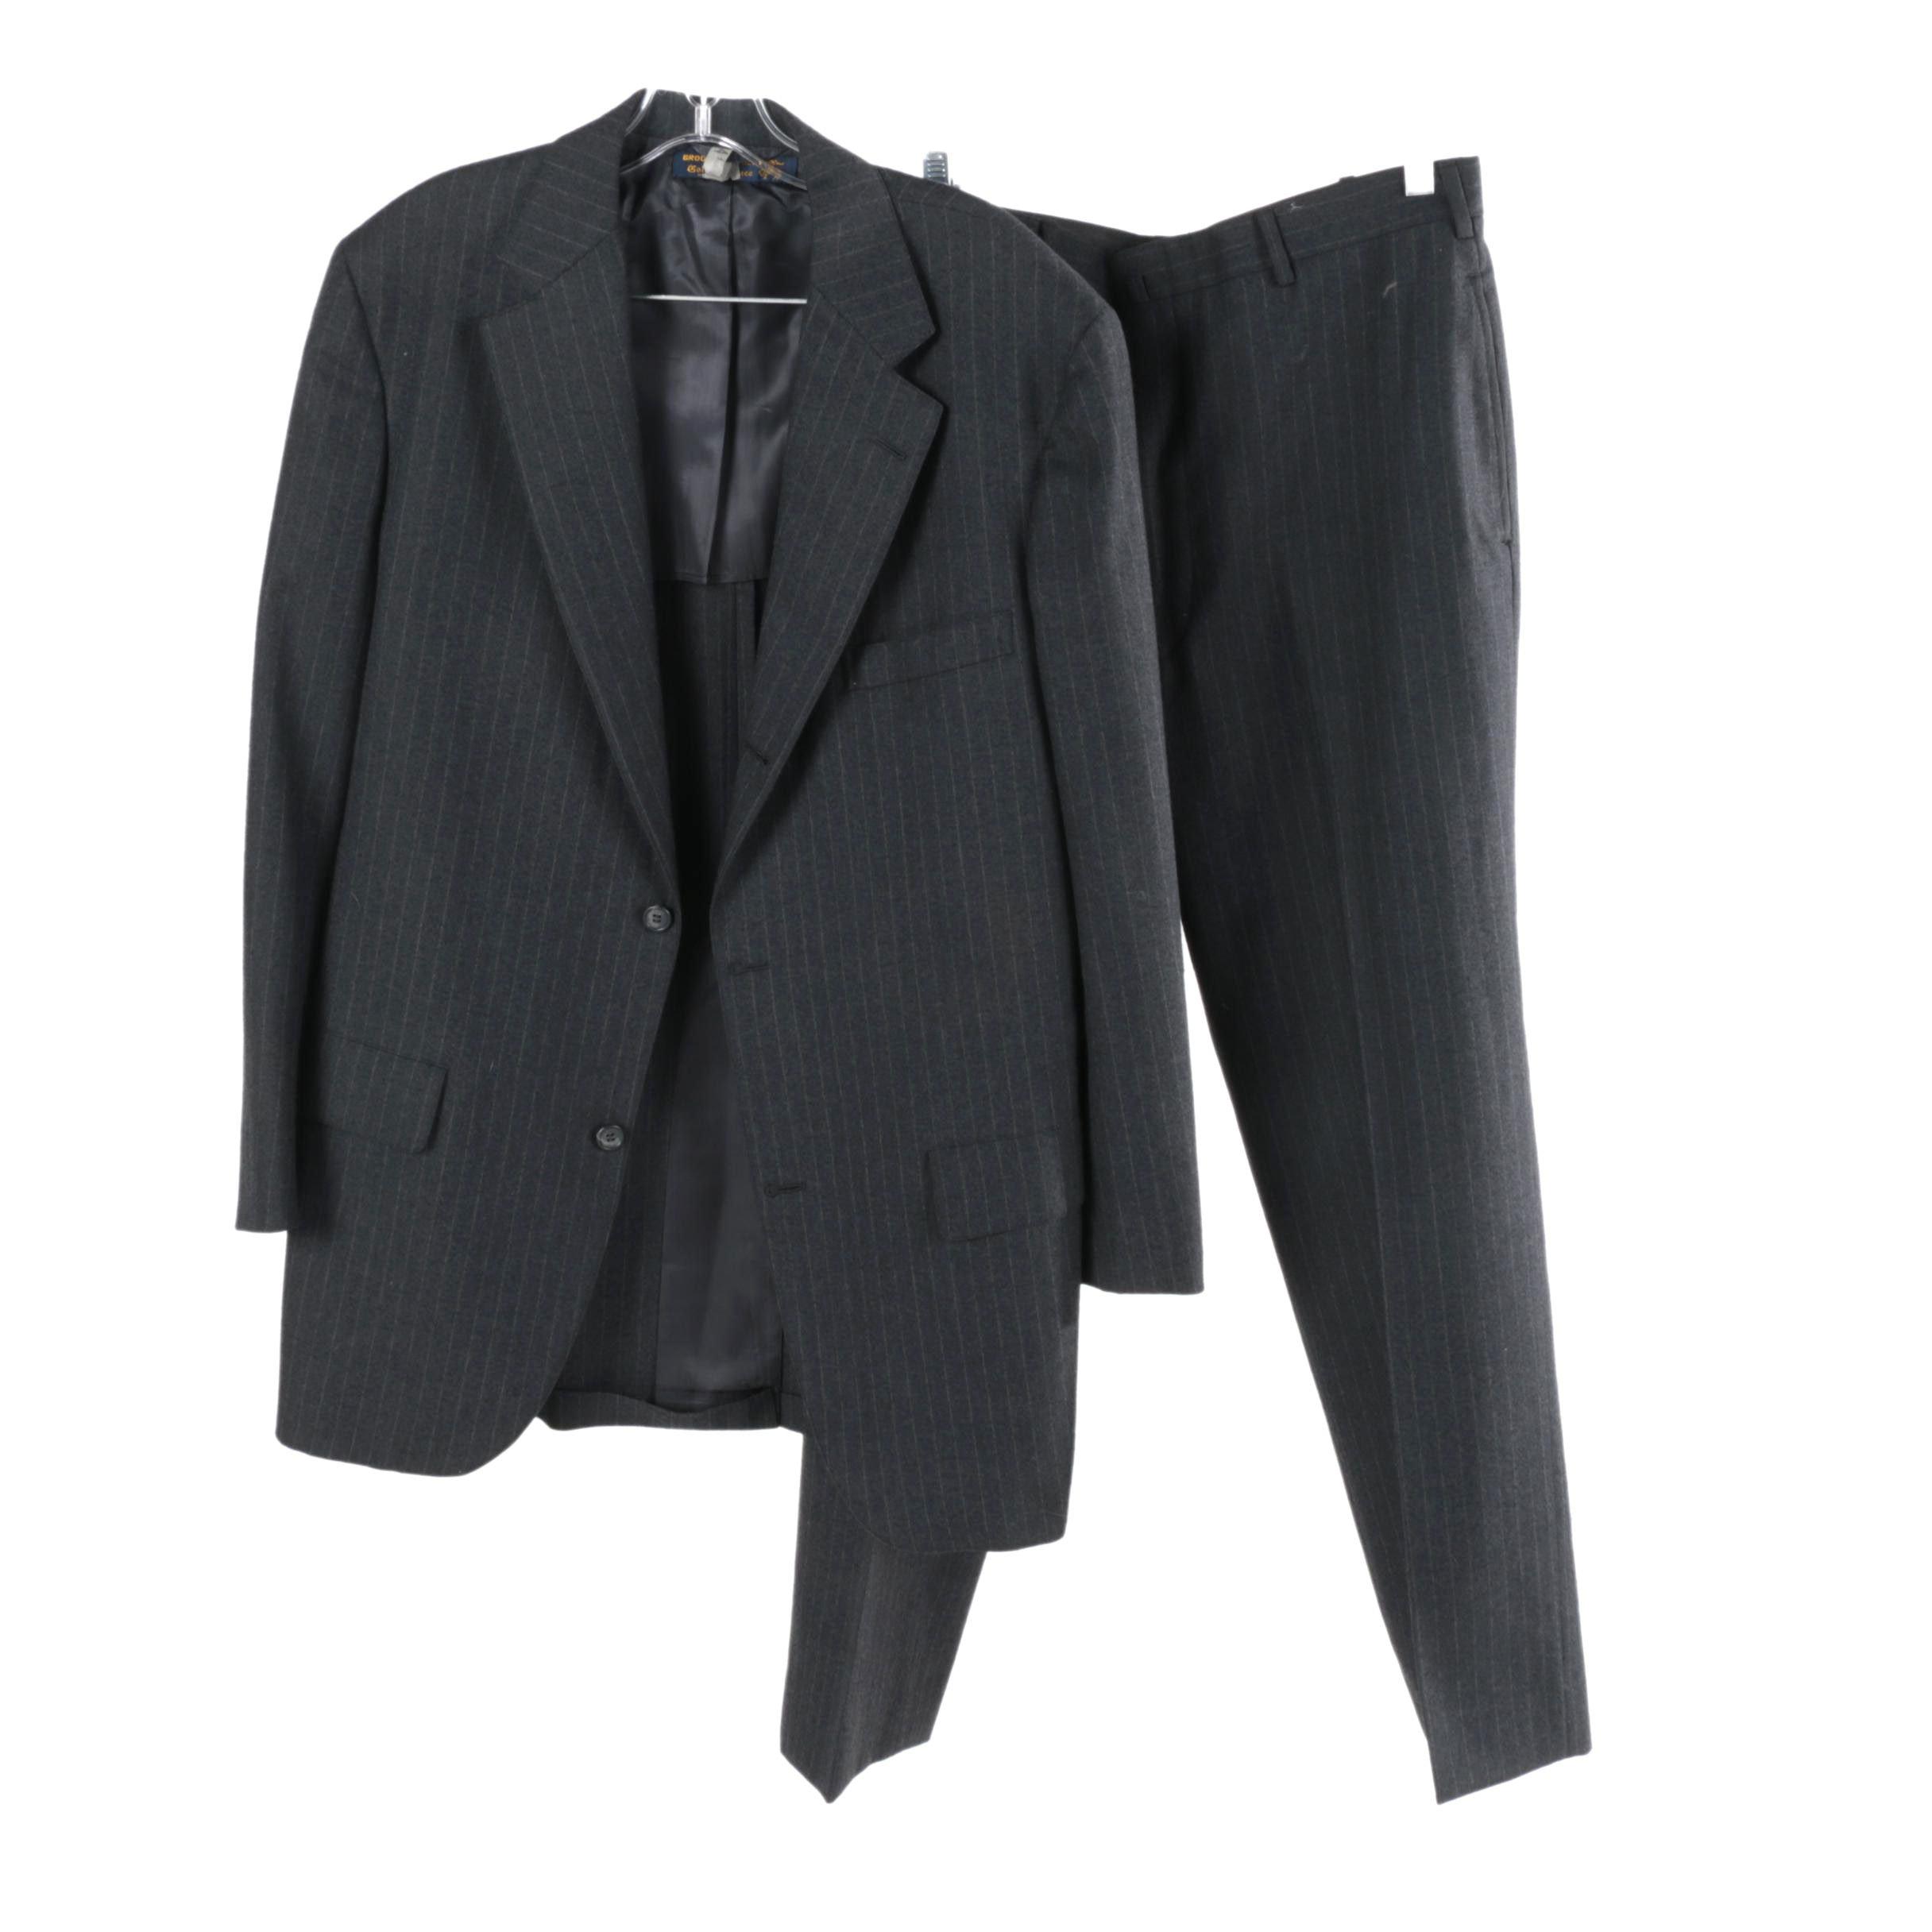 Men's Brooks Brothers Pinstripe Suit